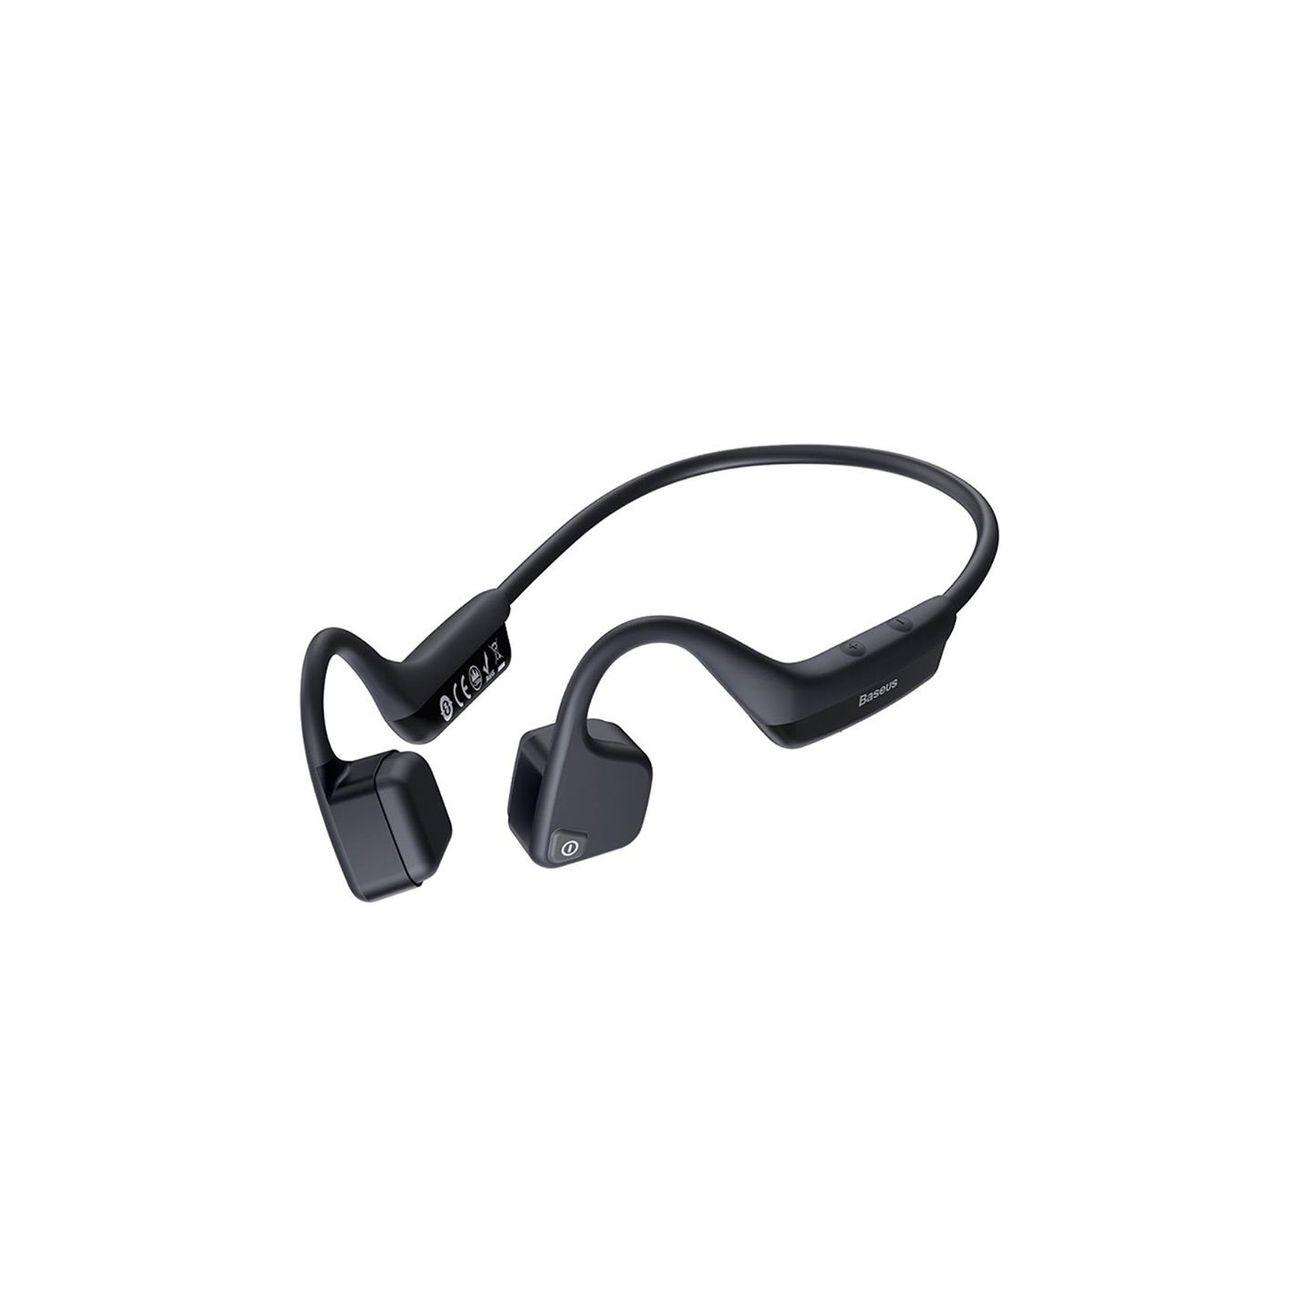 BASEUS Casque Bluetooth à conduction osseuse Baseus